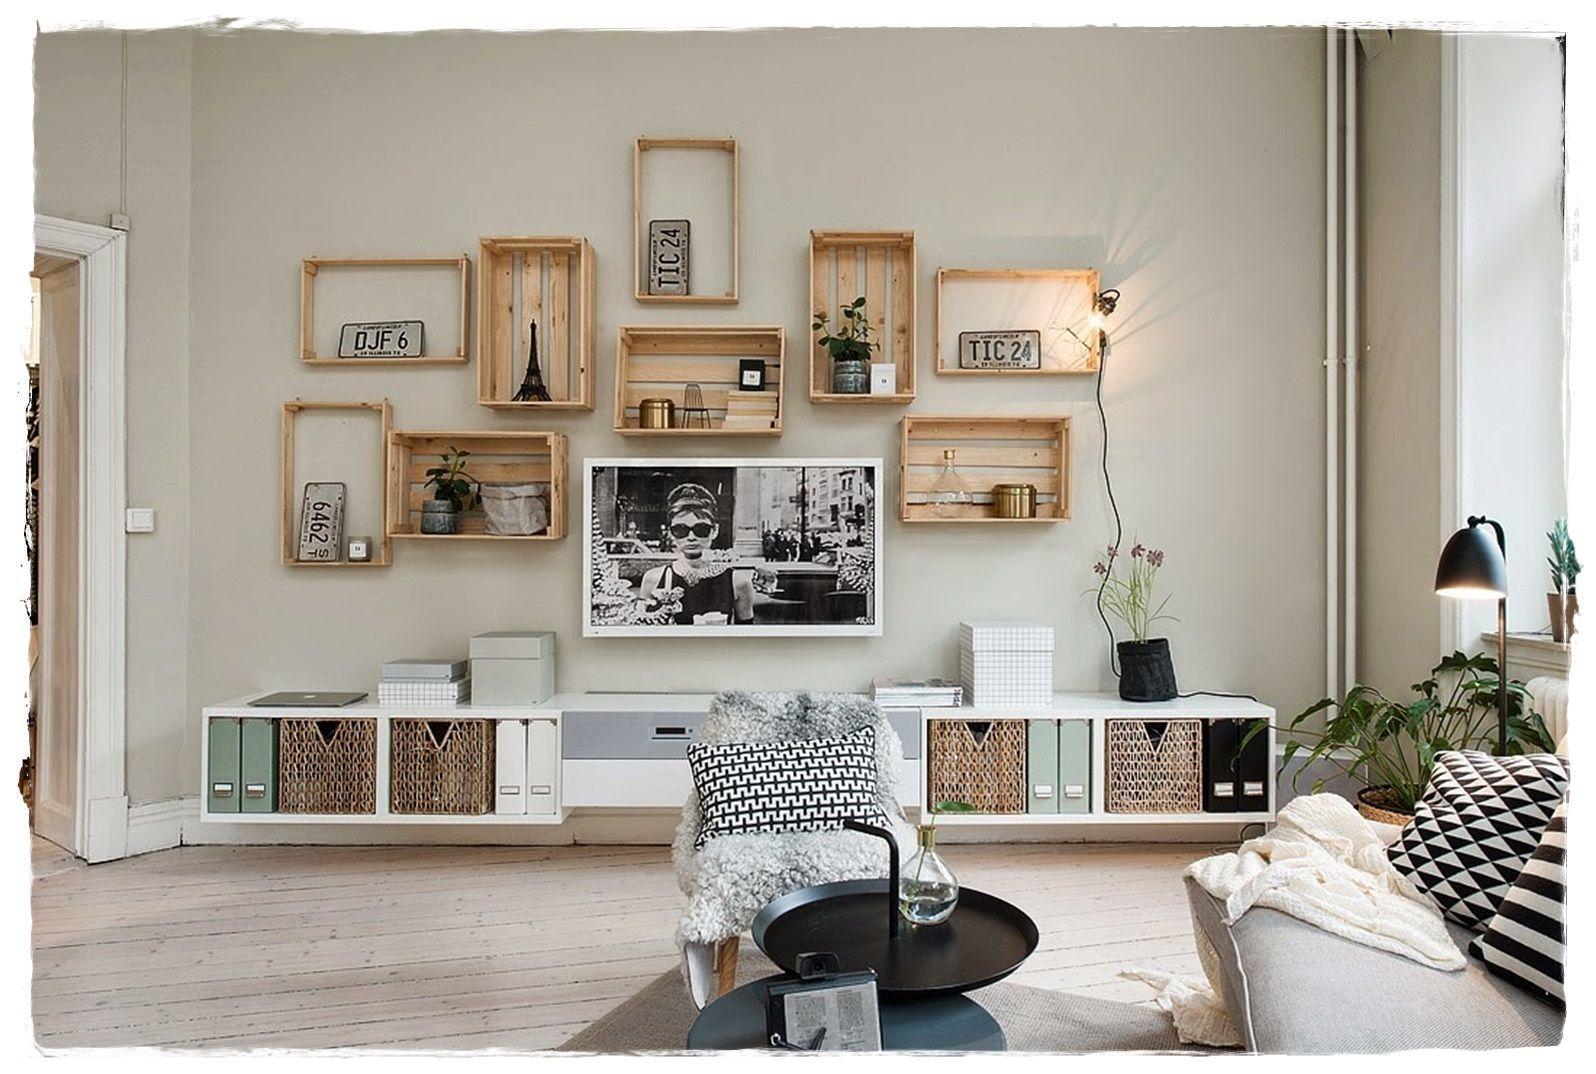 Myleimotiv Jpg 1 596 1 074 Pixeles Hooooome Pinterest  # Muebles Reto Asturias